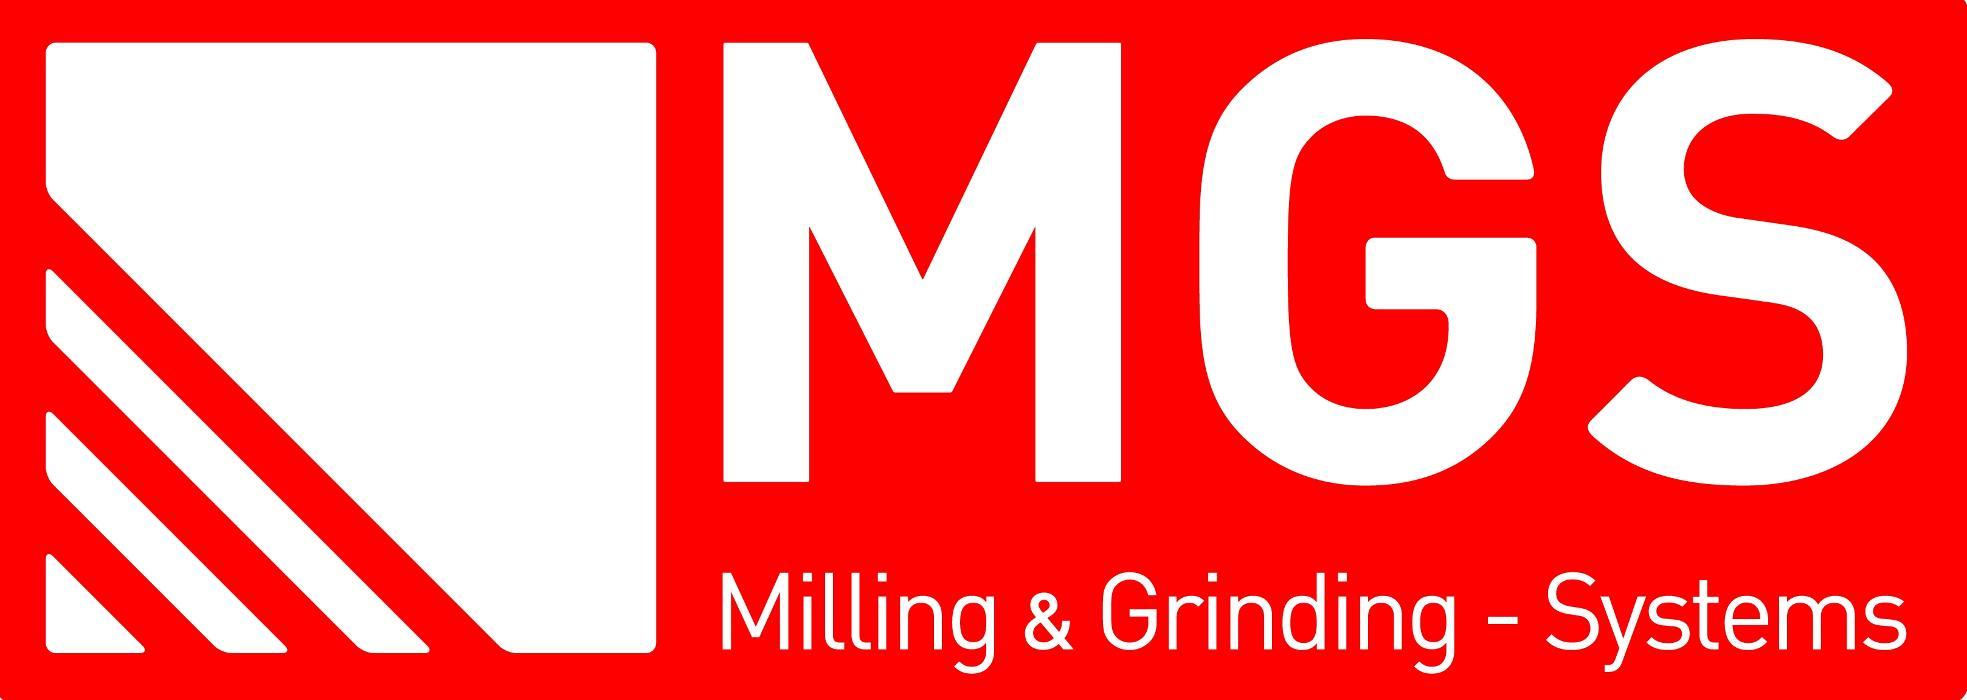 Bild zu MGS-Milling & Grinding - Systems GmbH in Nonnweiler